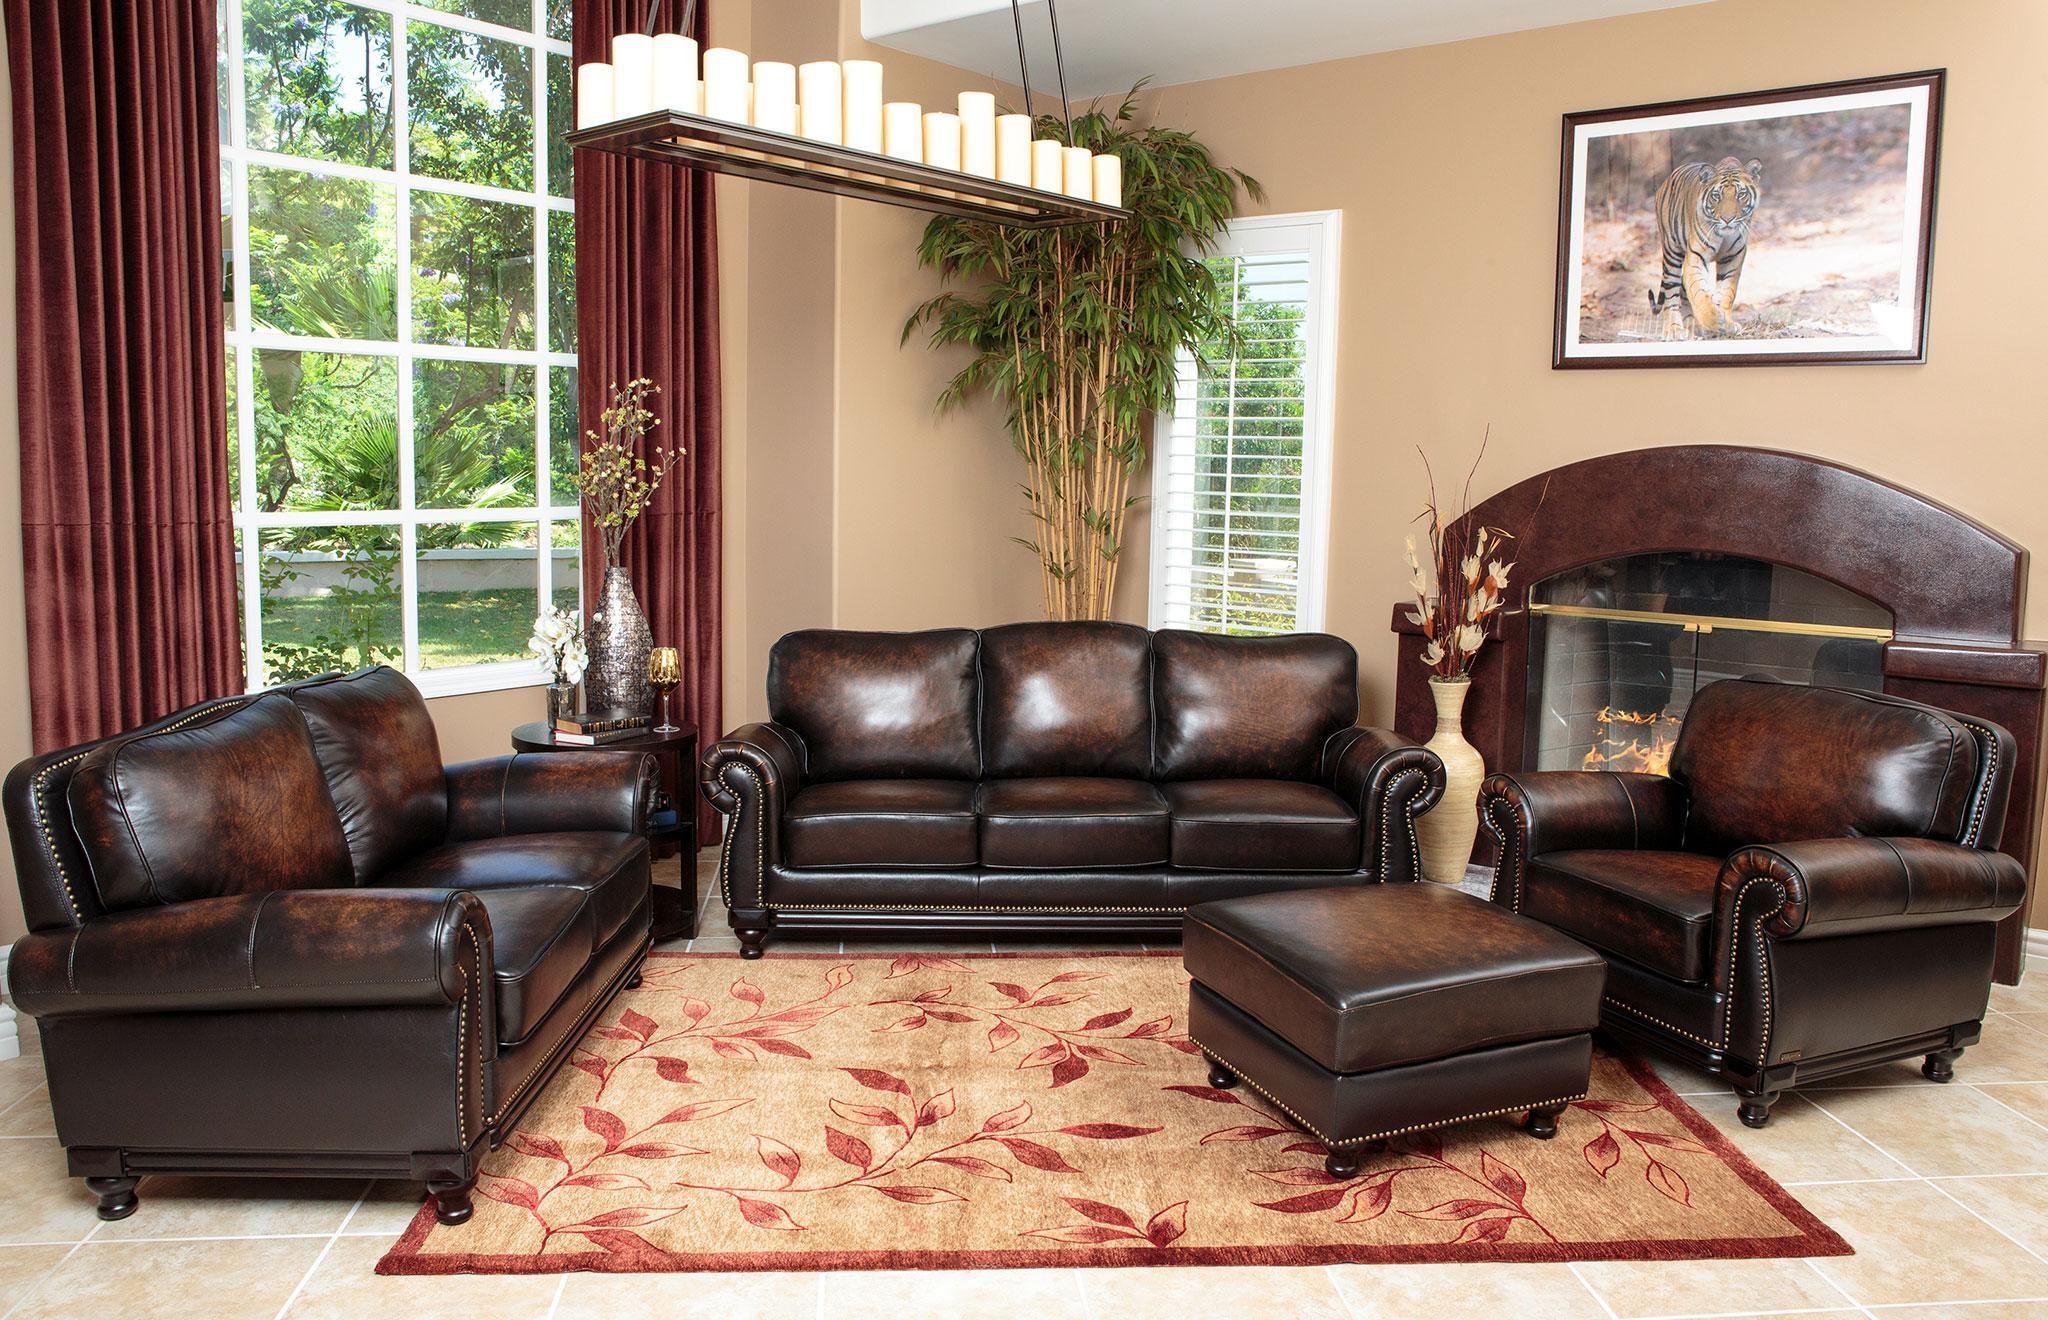 Sofas Center : Abbyson Living Sk Brn Excellent Sofa Photo Concept Inside Abbyson Sofas (Image 19 of 20)